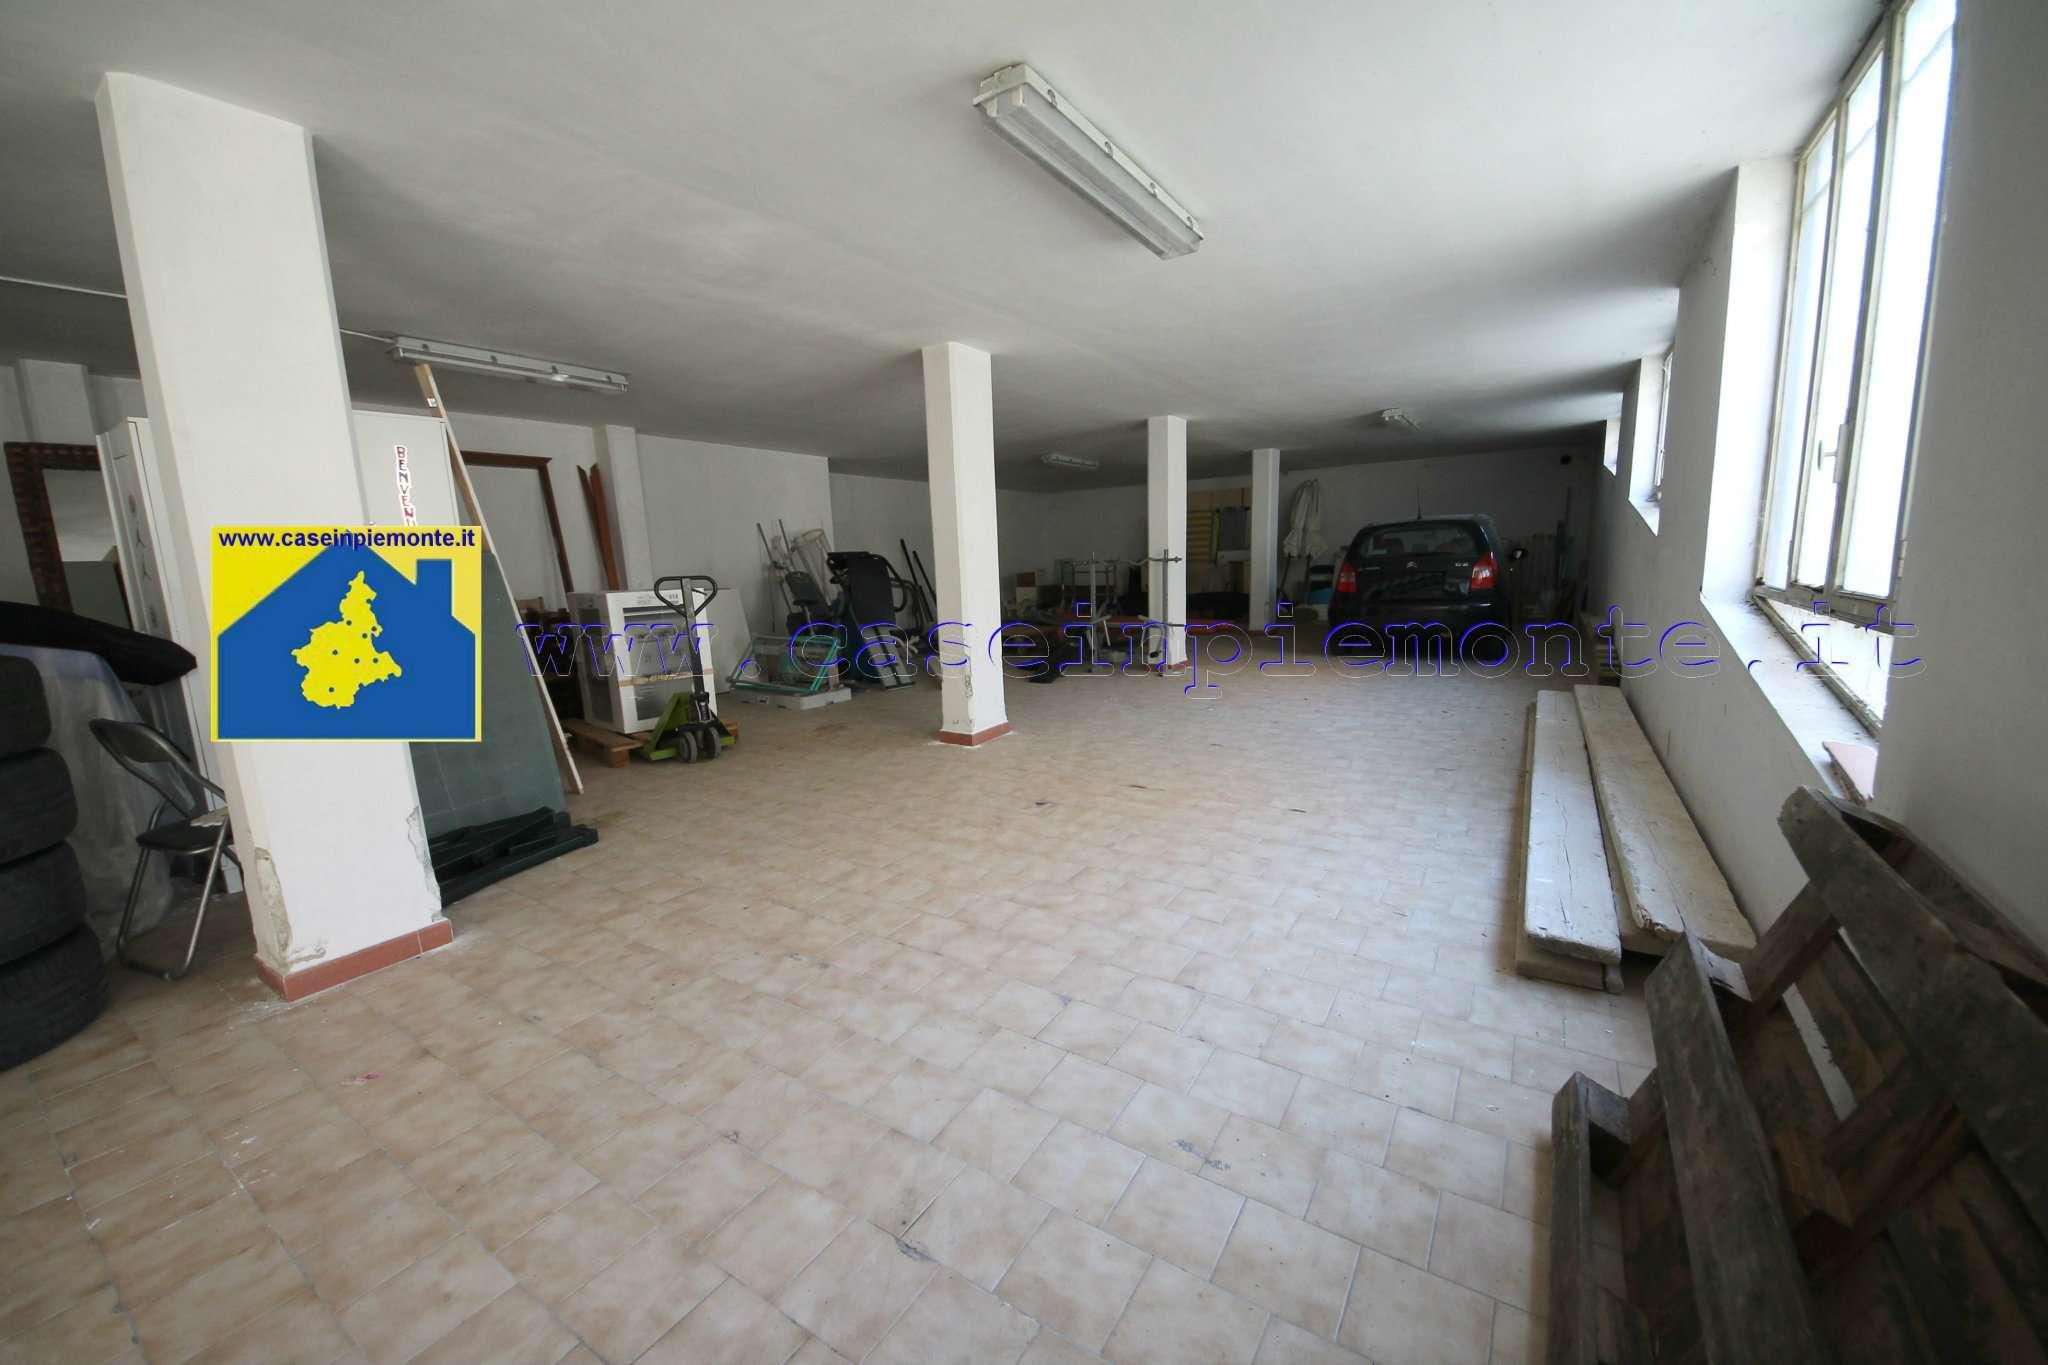 Foto 1 di Box / Garage via ferna 23, Alpignano